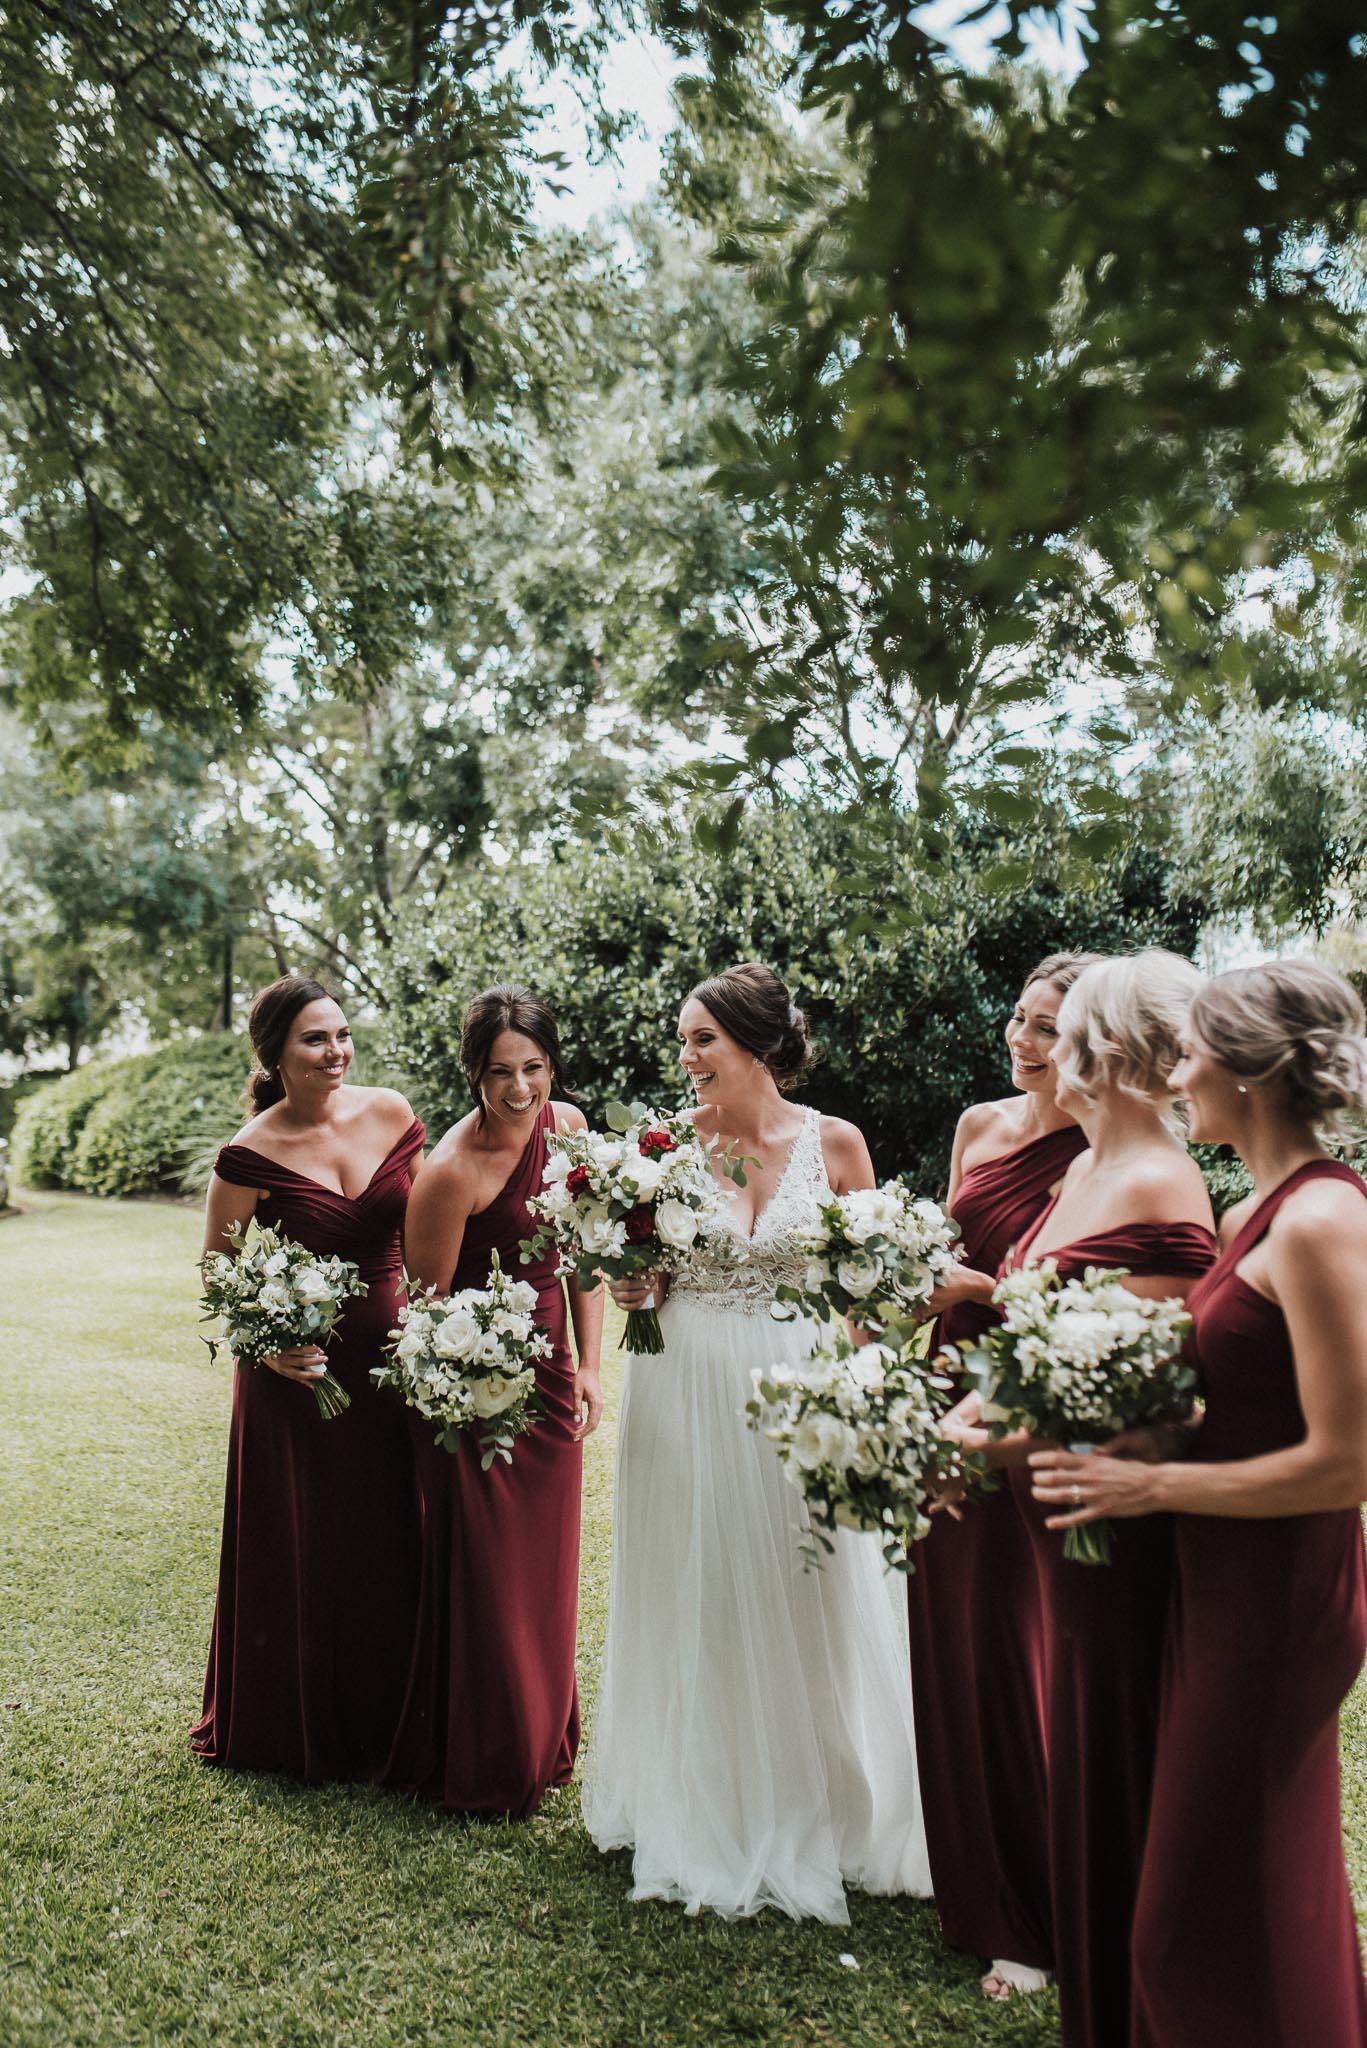 MECURE-RESORT-WEDDING-KING-WEB-254.jpg